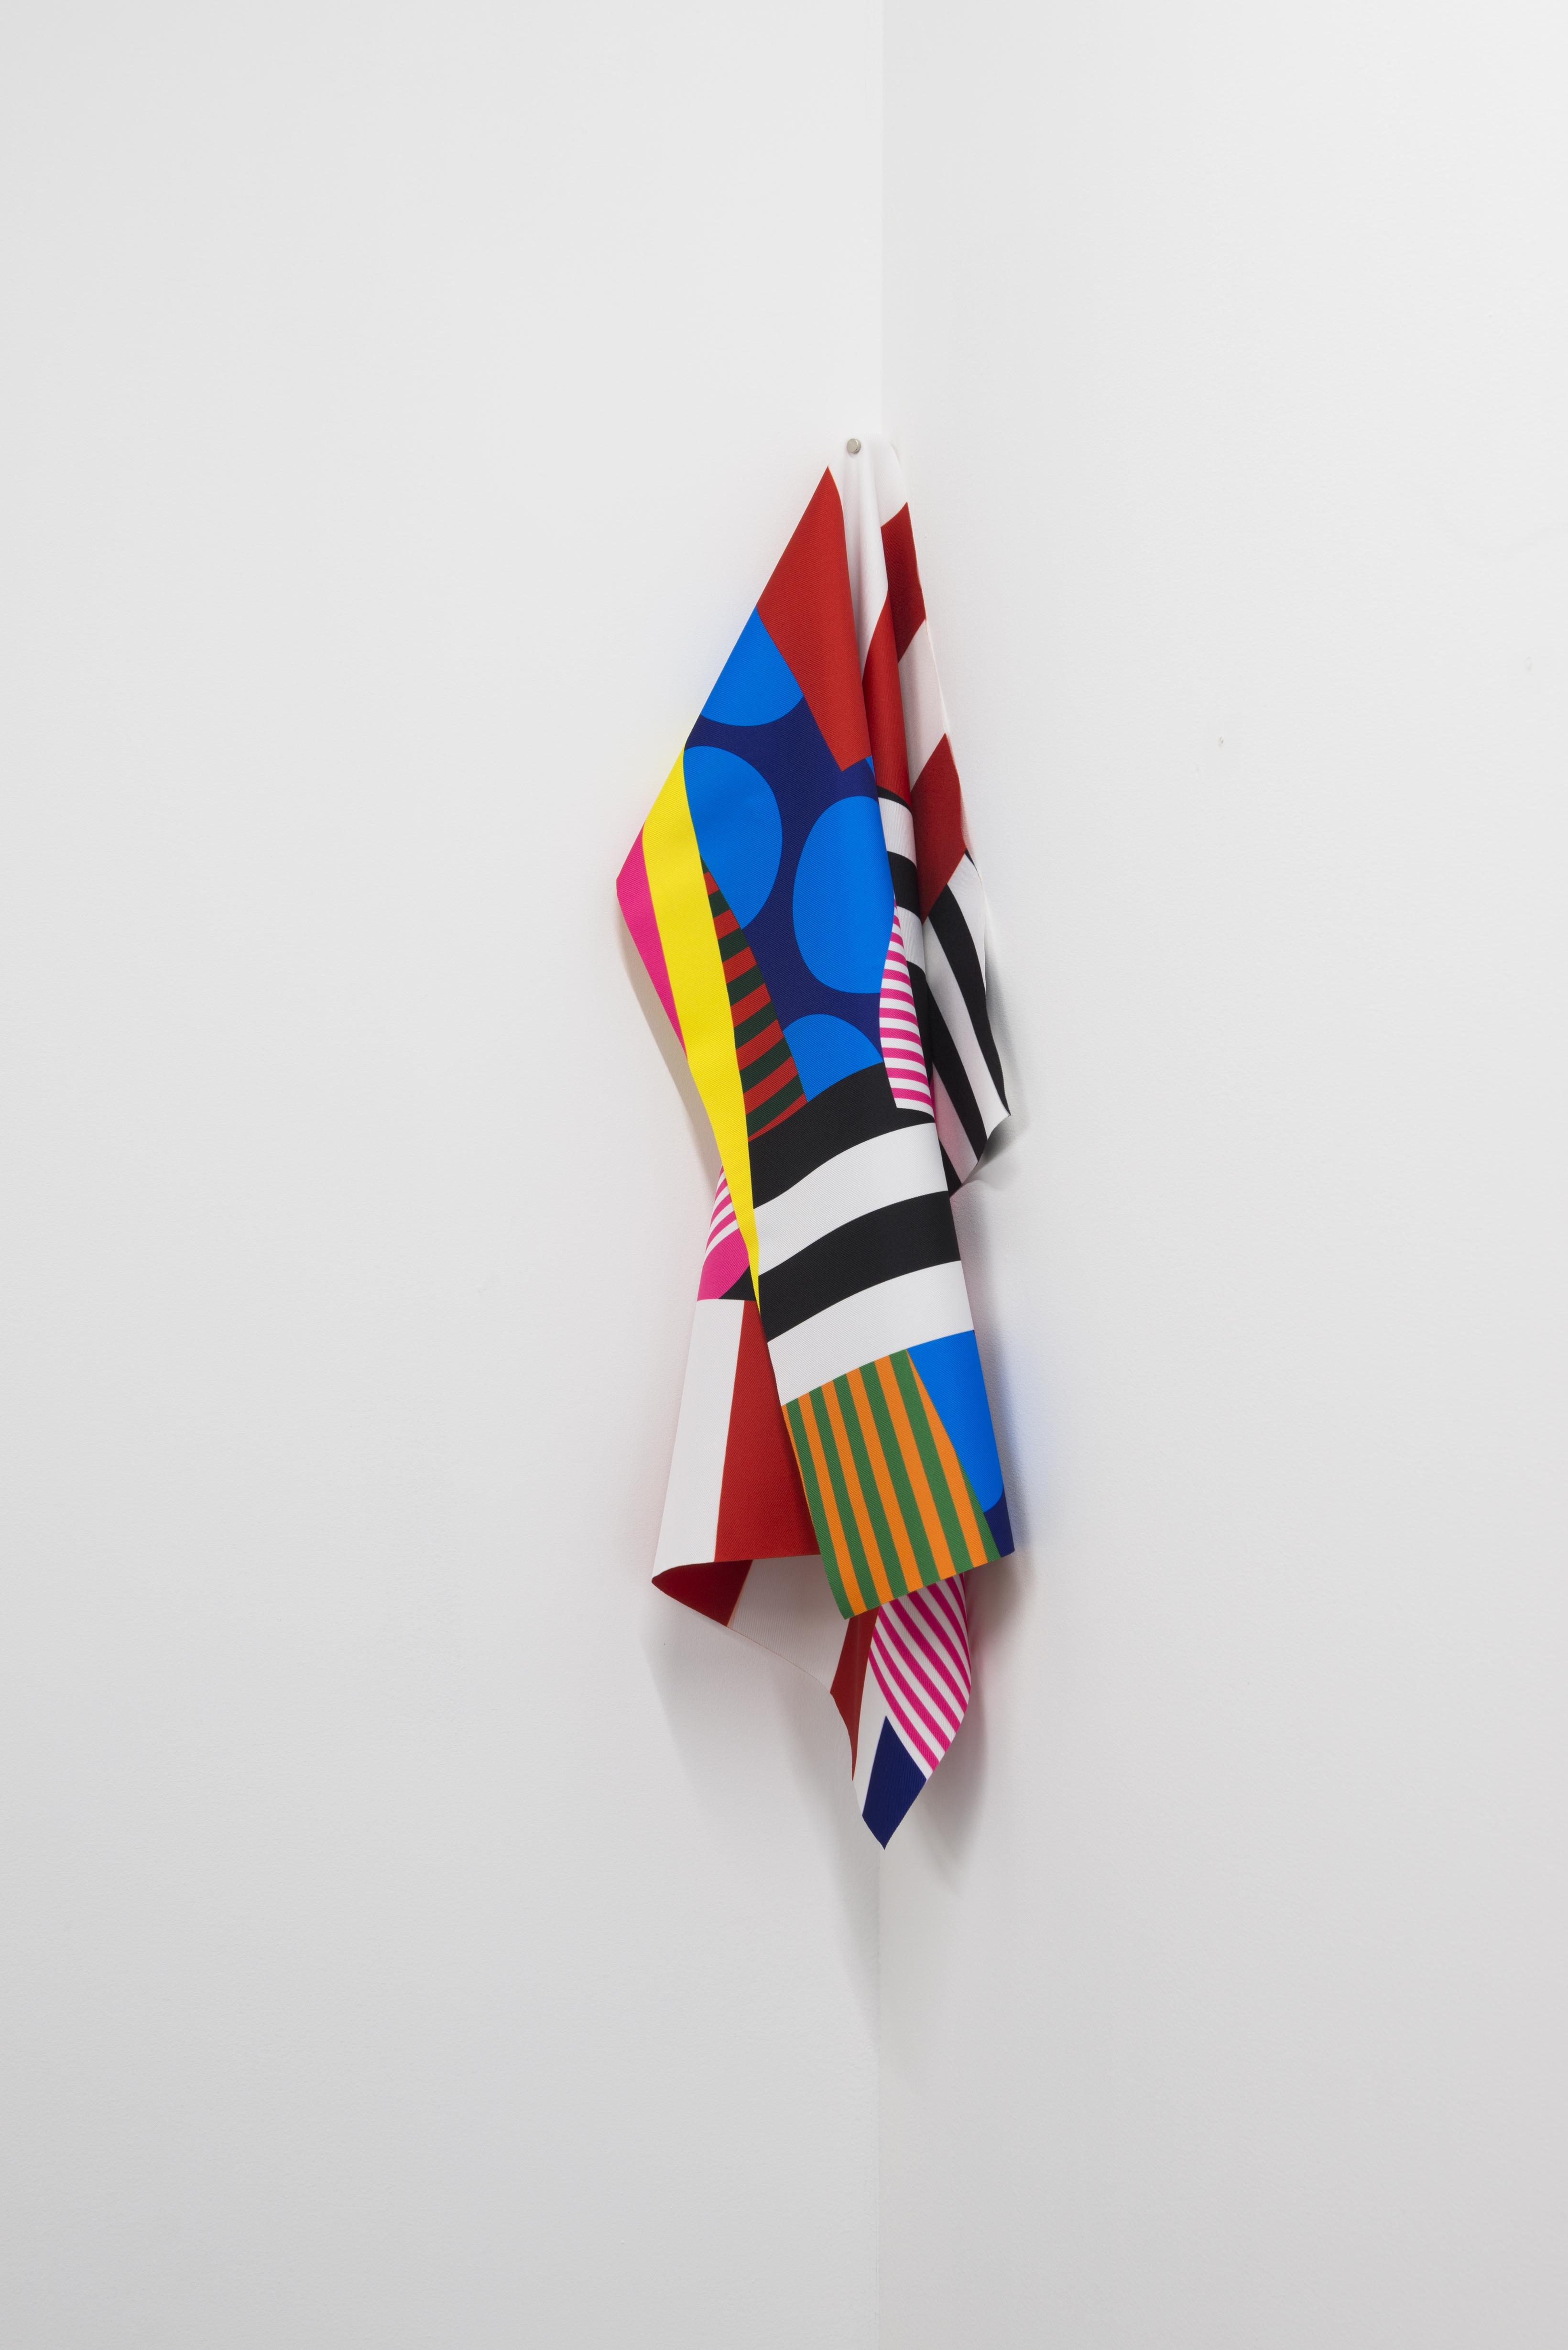 "Installation view from group exhibition ""Shunsuke Imai, Kenjiro Okazaki, Enrico Isamu Ōyama,"" 2015, Takuro Someya Contemporary Art"